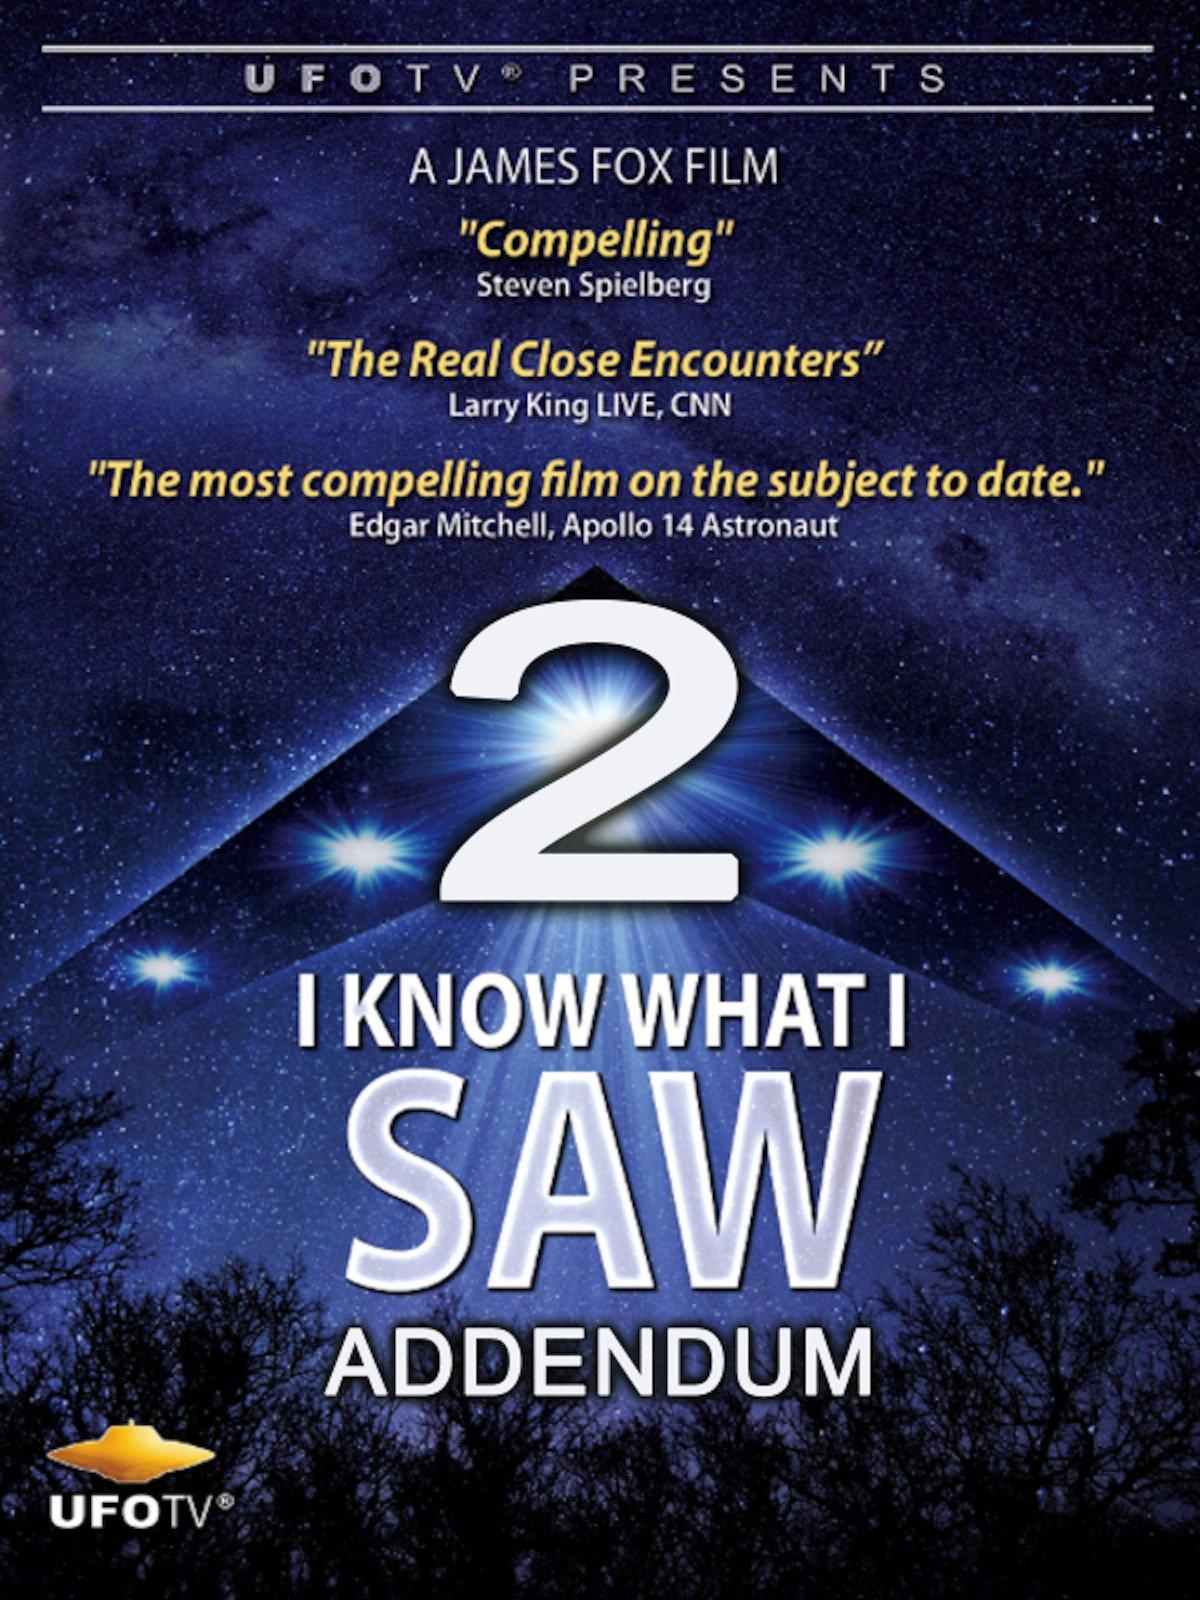 UFOTV Presents: I Know What I Saw Part 2 Addendum